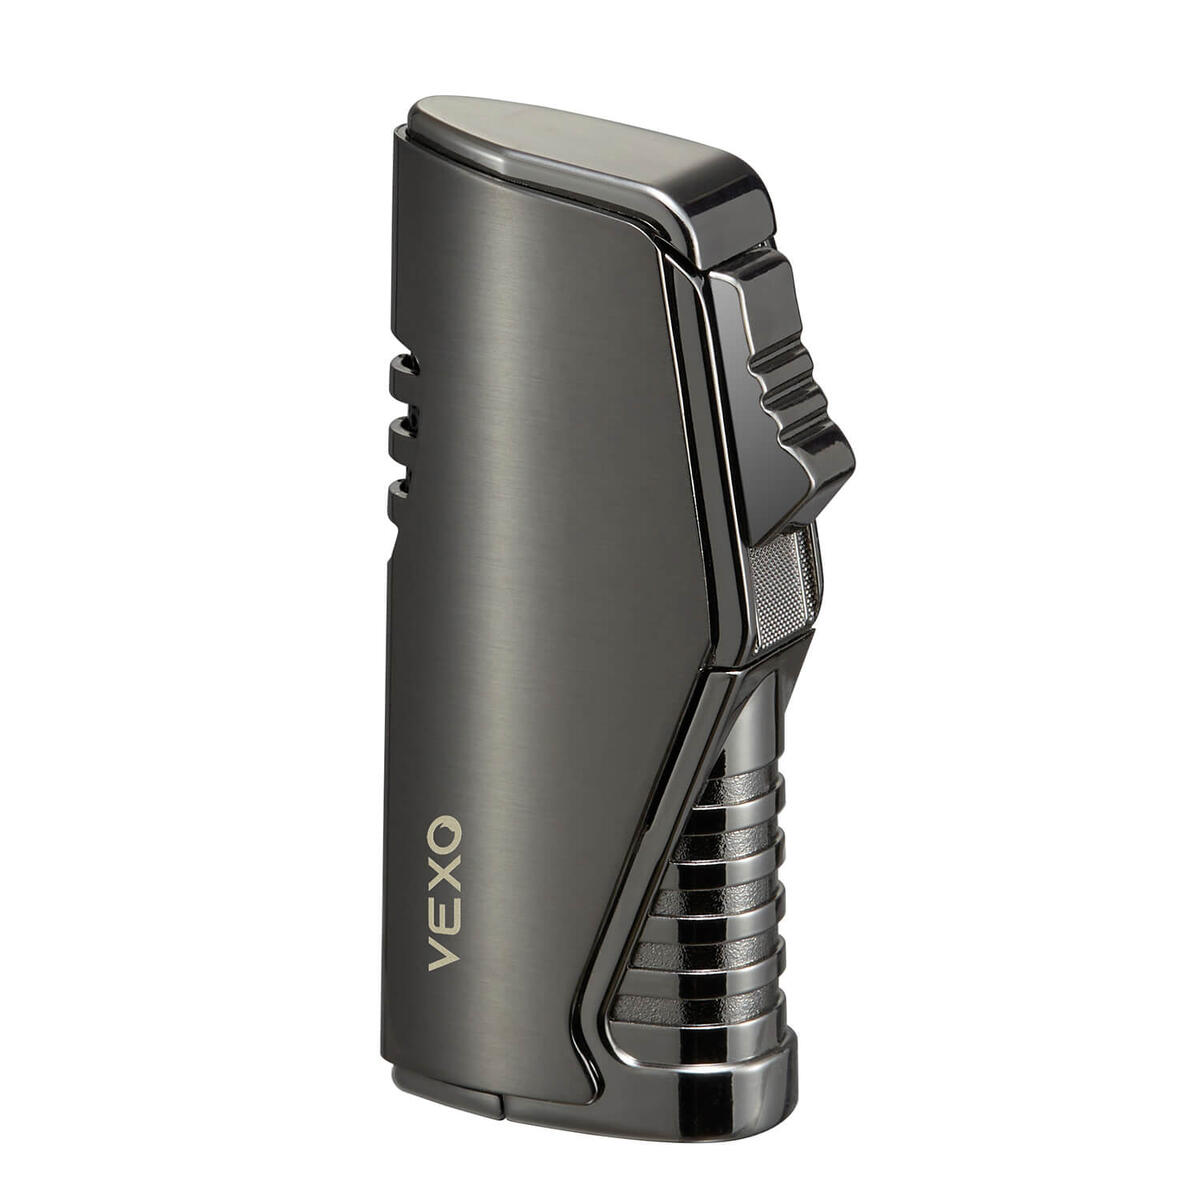 Torch Lighter, Cigar Lighter Refillable Butane Lighter Adjustable Flame with Cigar Punch (Butane NOT Included) (Black Nickel)